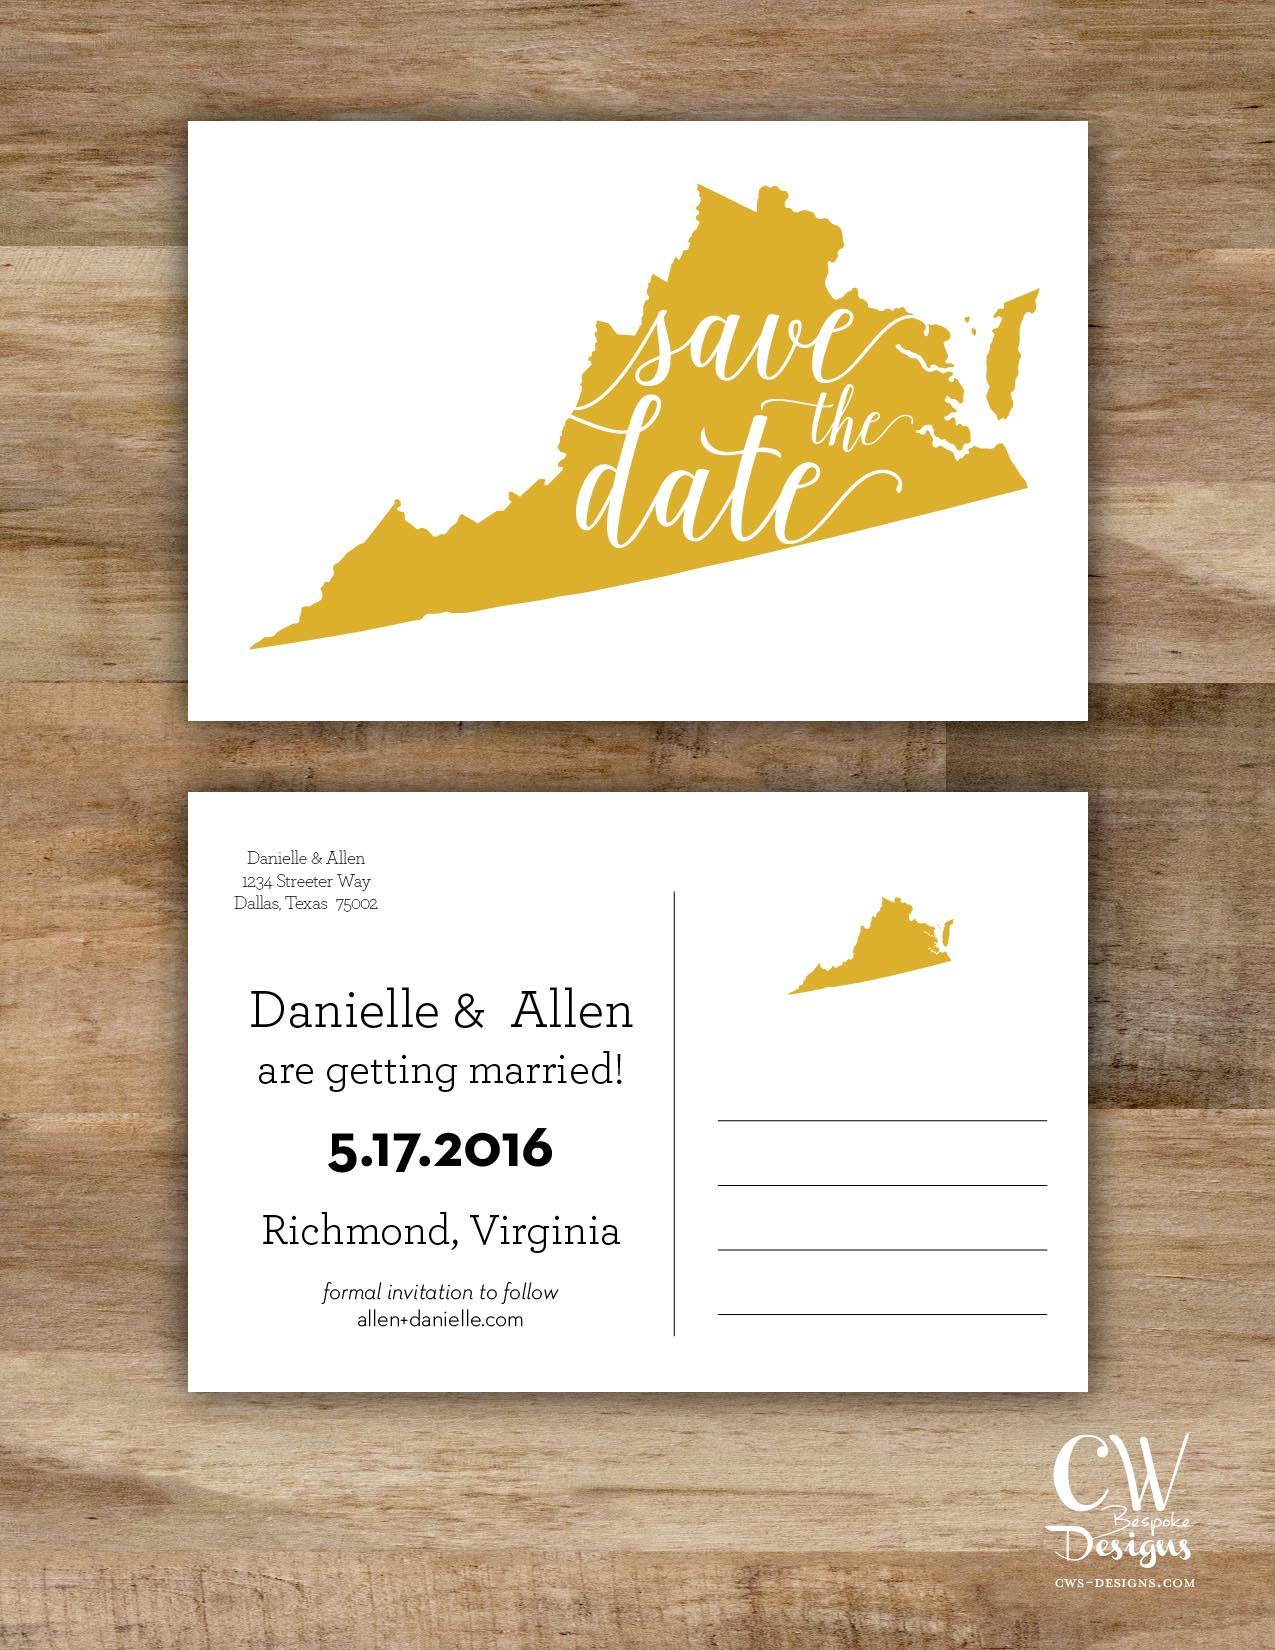 Save the Date Postcard Virginia.jpg